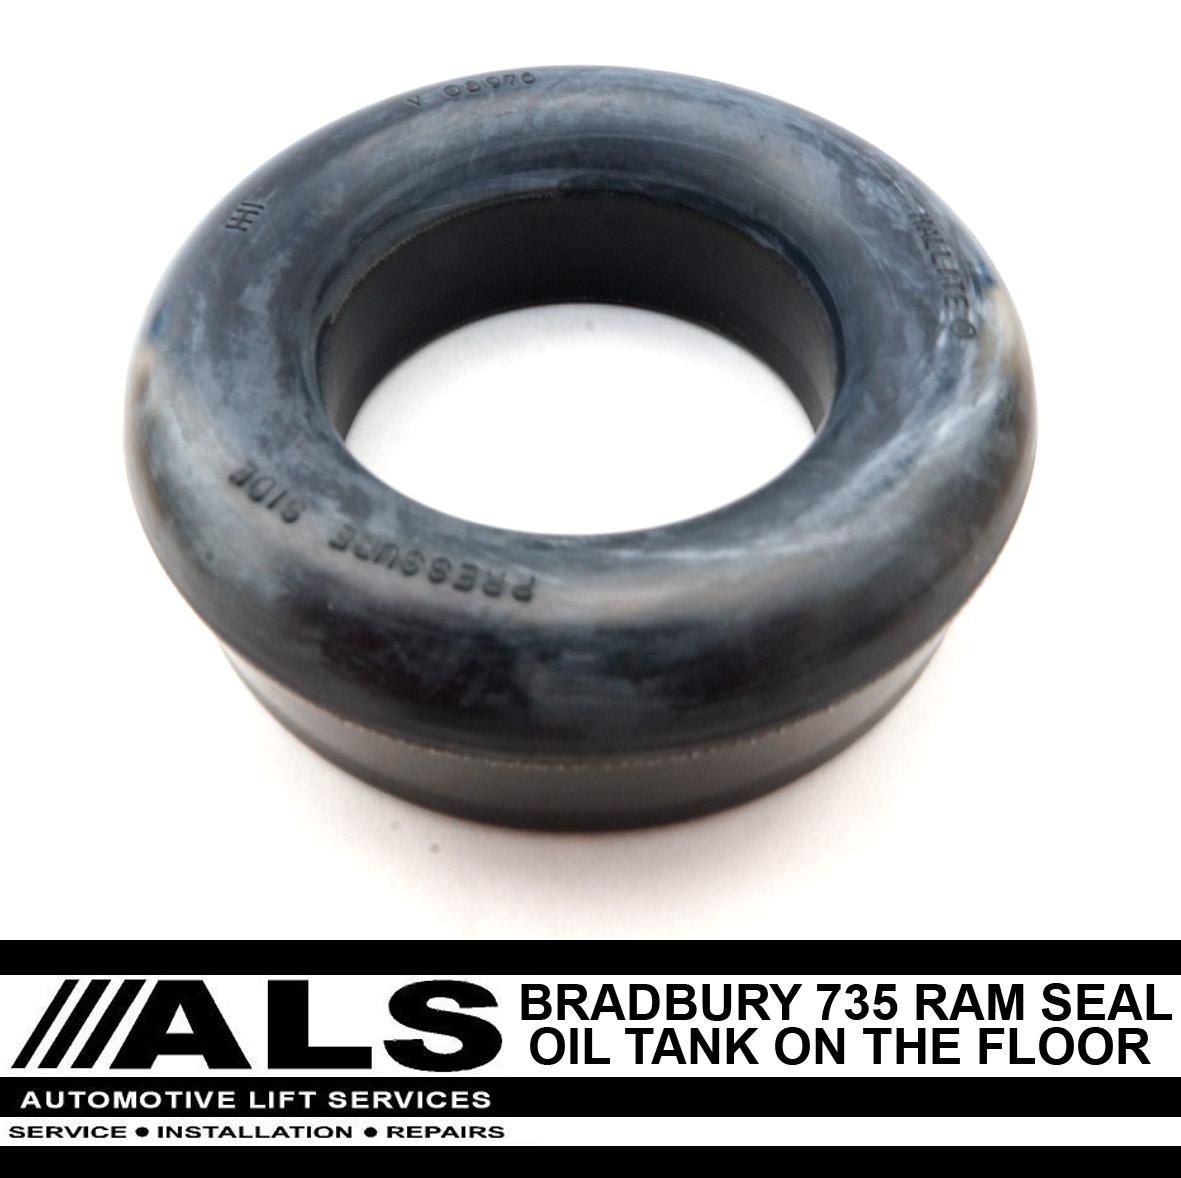 Bradbury Mk1 Ram Seal